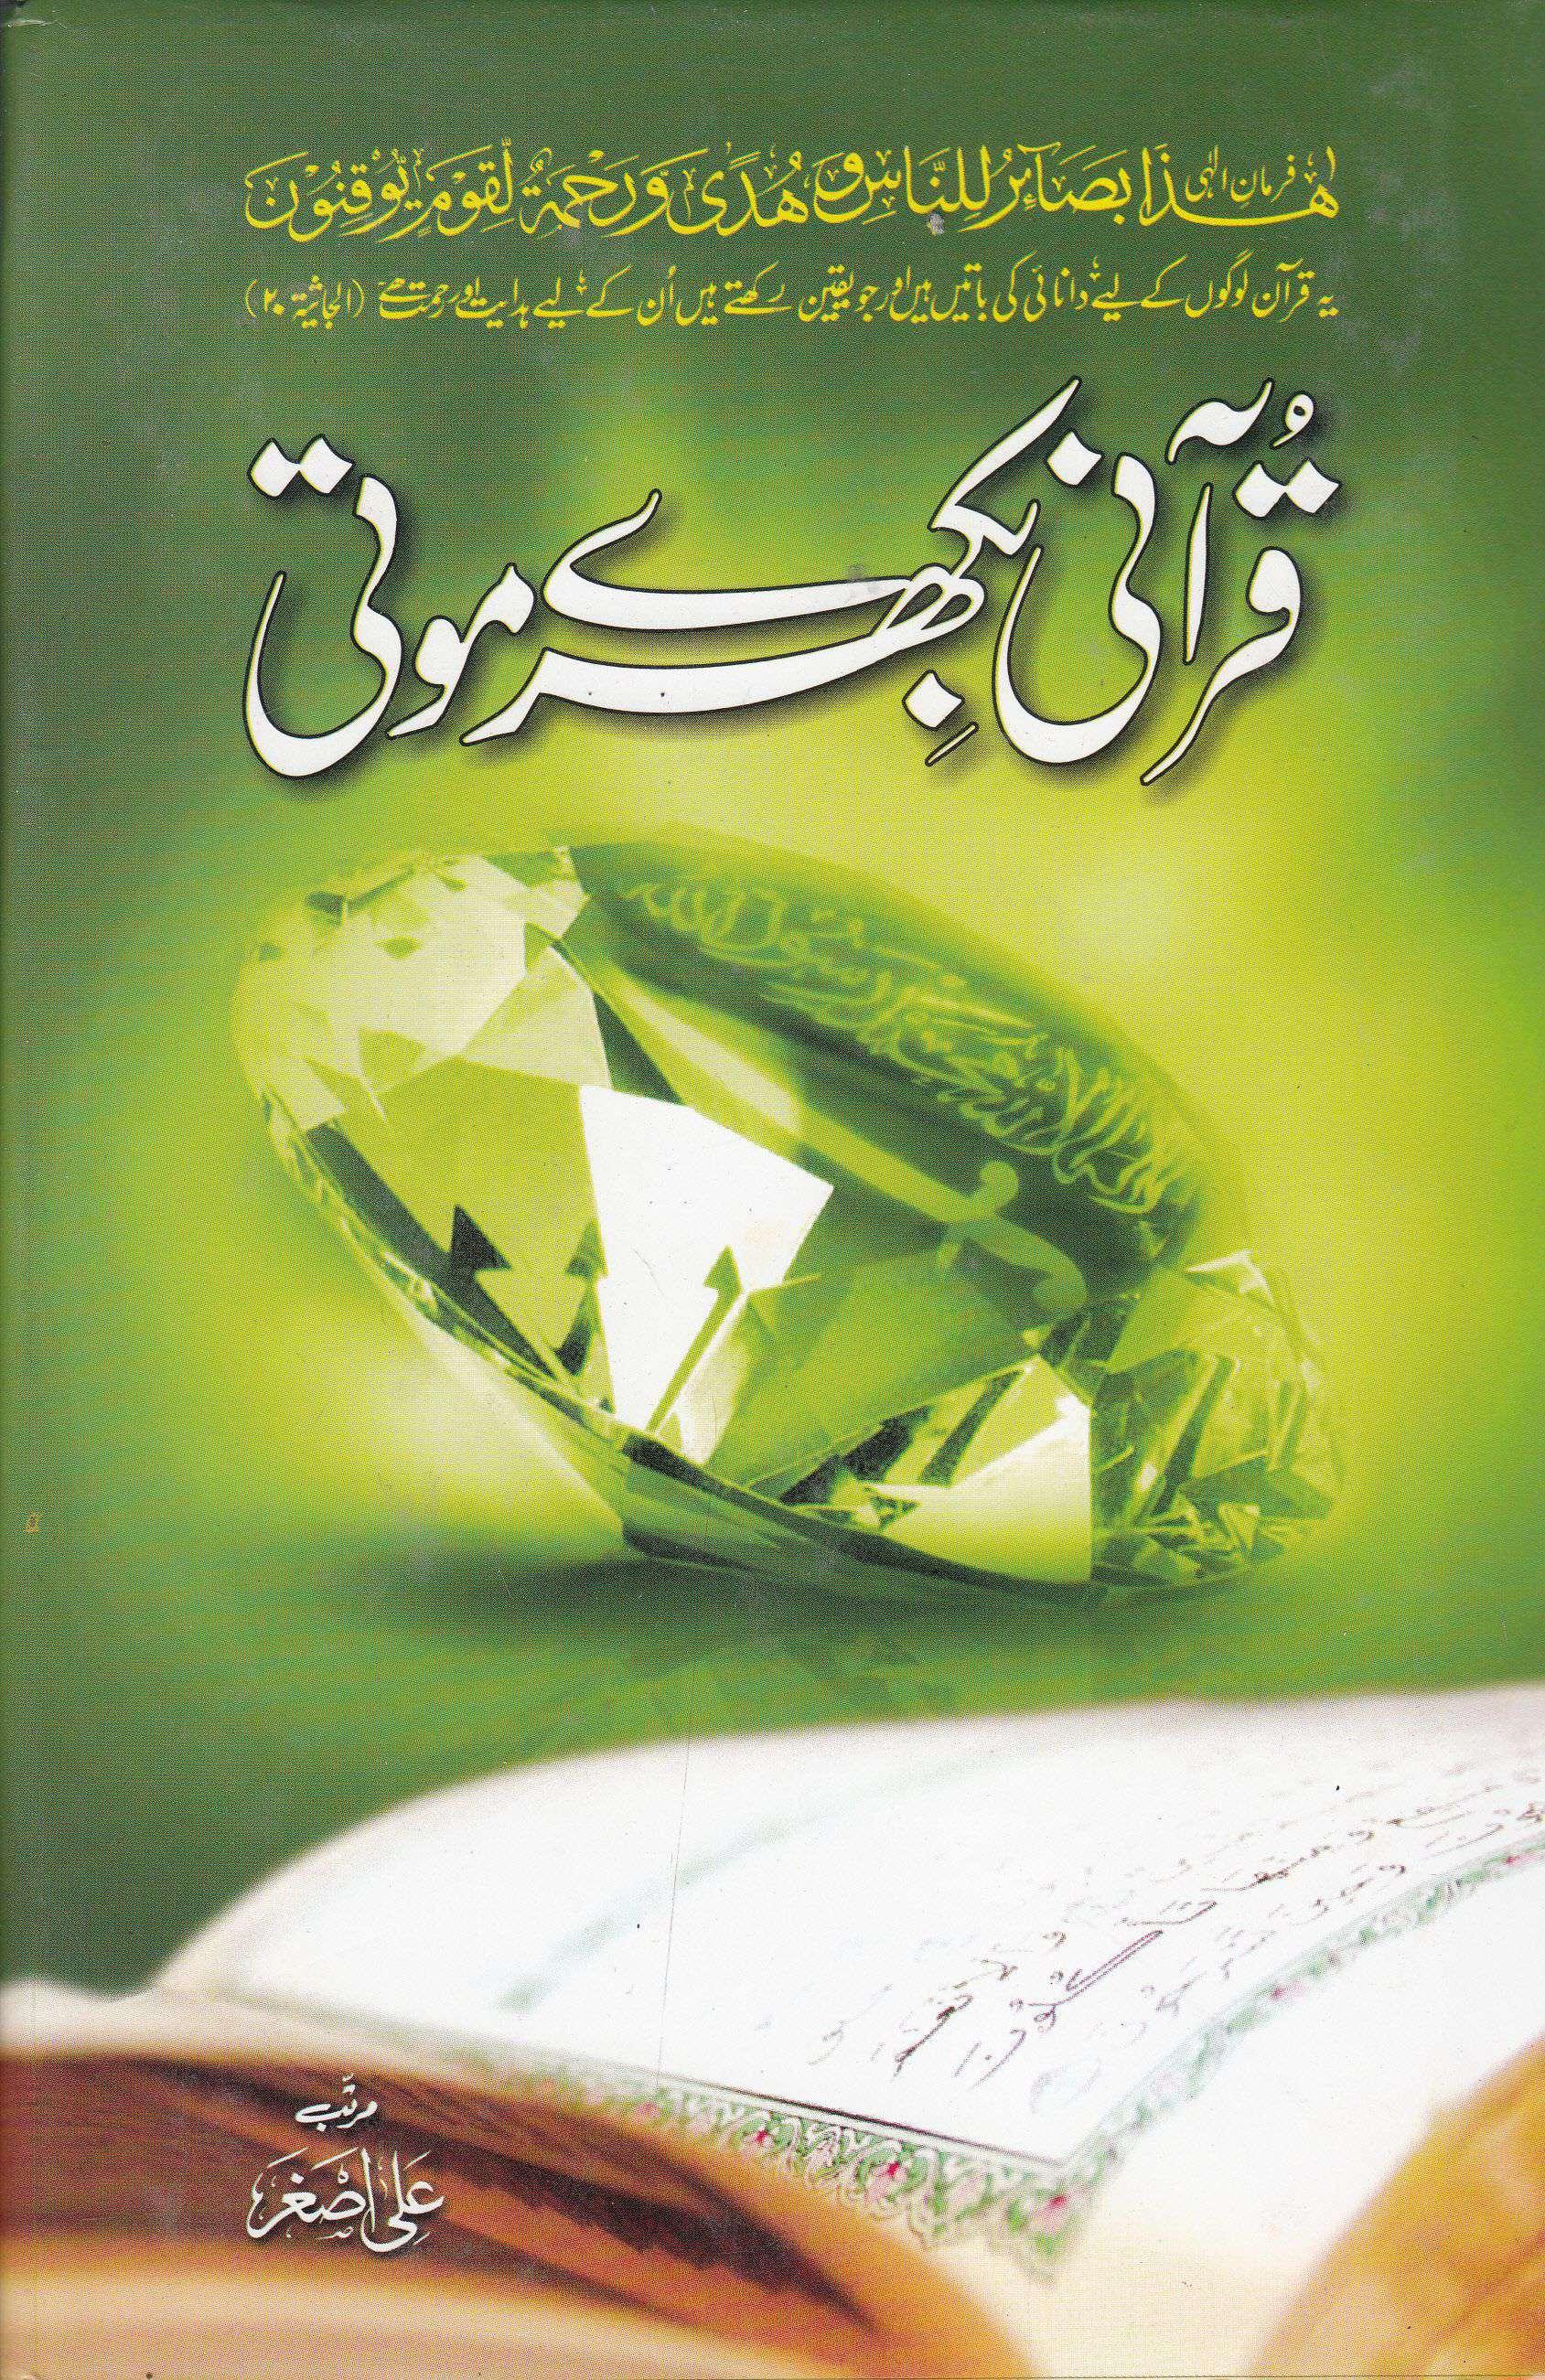 Qurani Bhikray Moti